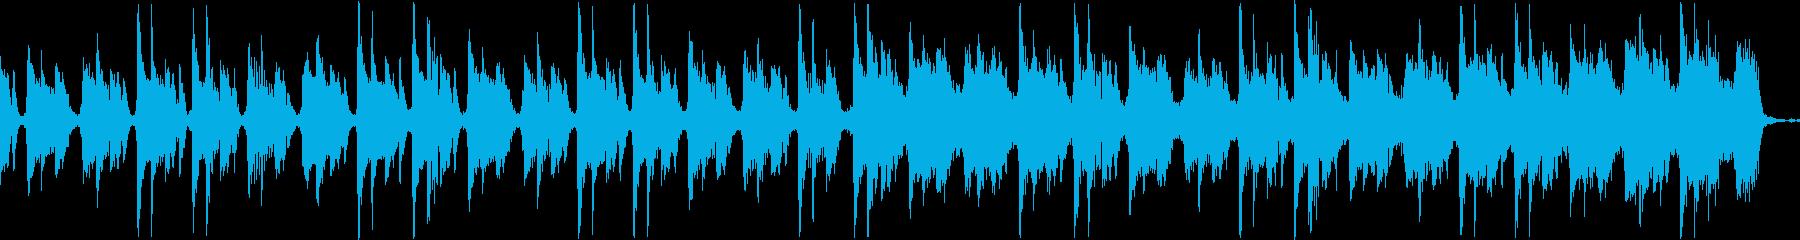 【CM】クールなエレクトロBGM・9の再生済みの波形